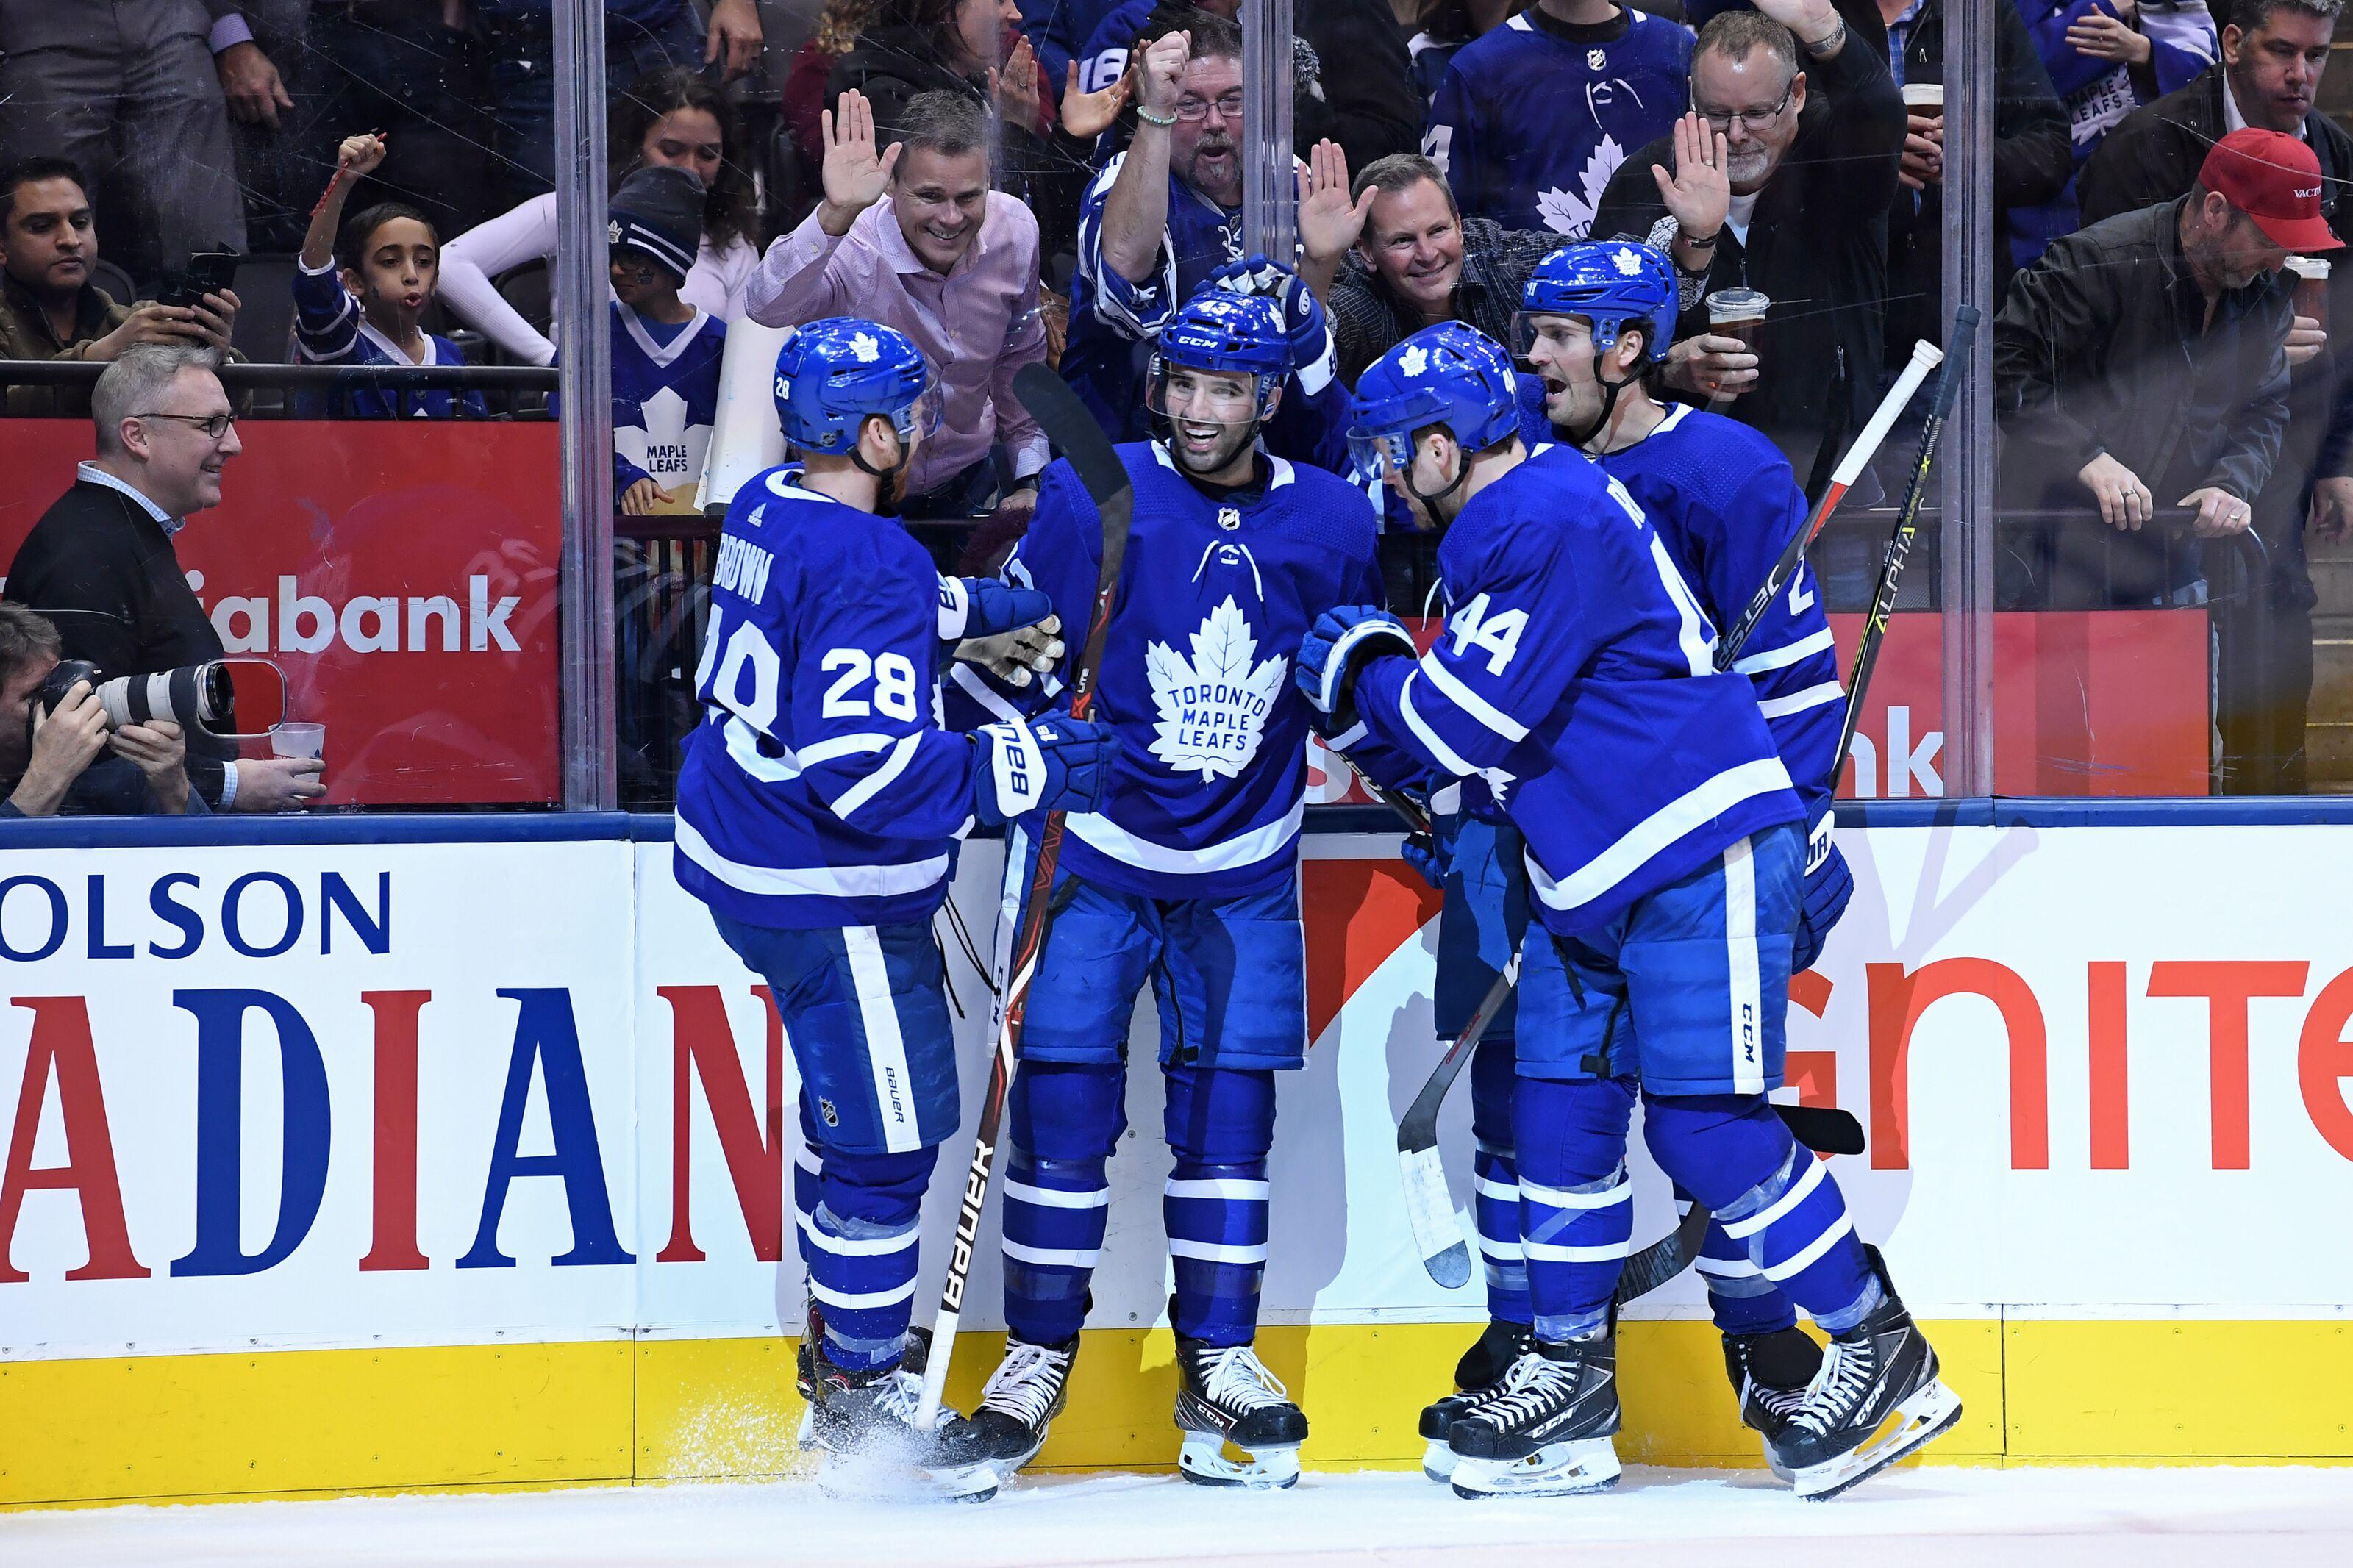 dbd46aa3 Toronto Maple Leafs Power-Play Finally Breaks Out